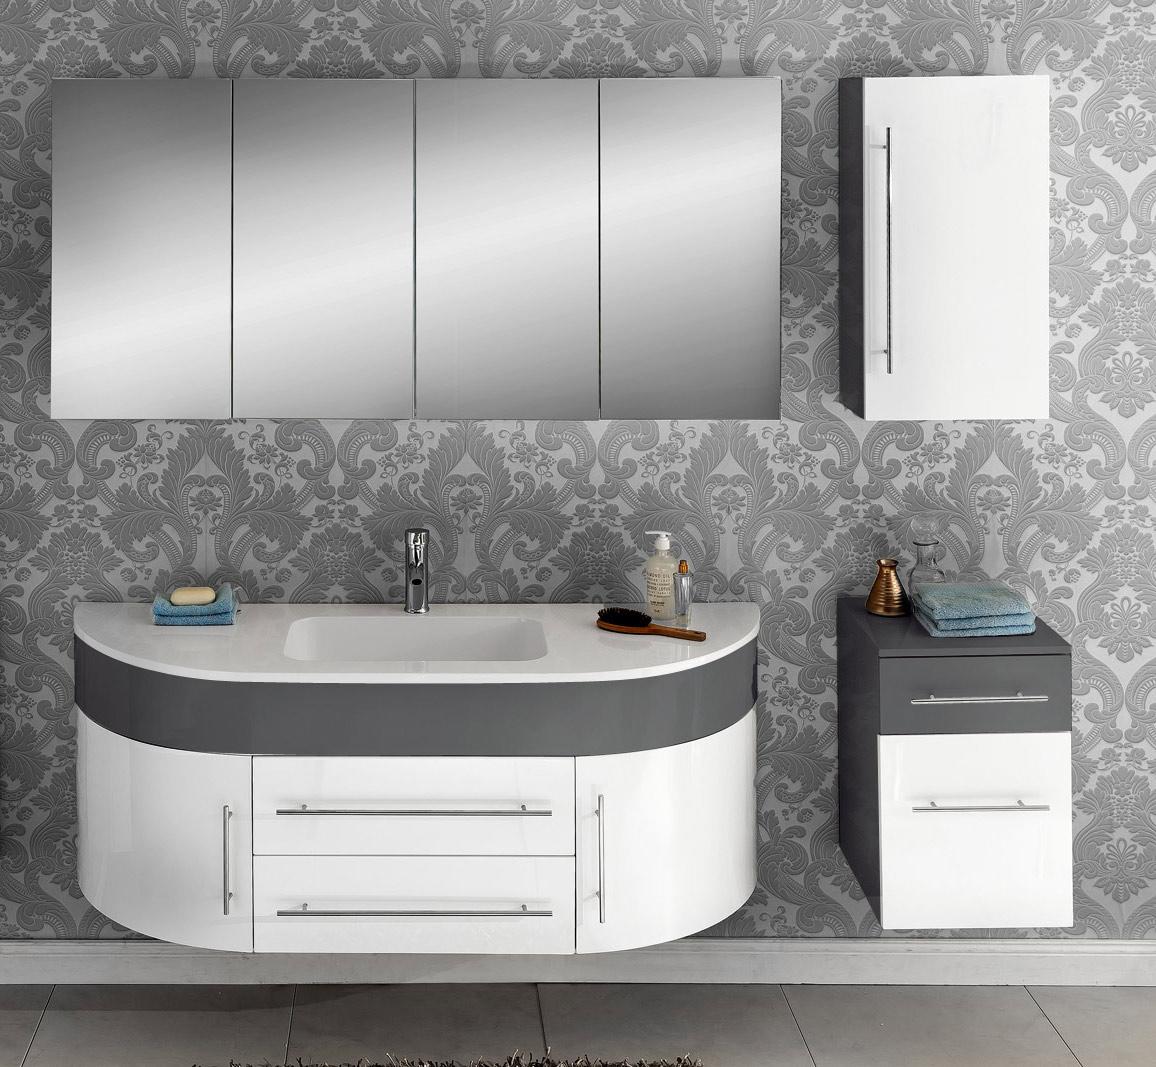 sam badm bel set 4tlg waschbecken 140 cm grau wei dublin demn chst. Black Bedroom Furniture Sets. Home Design Ideas